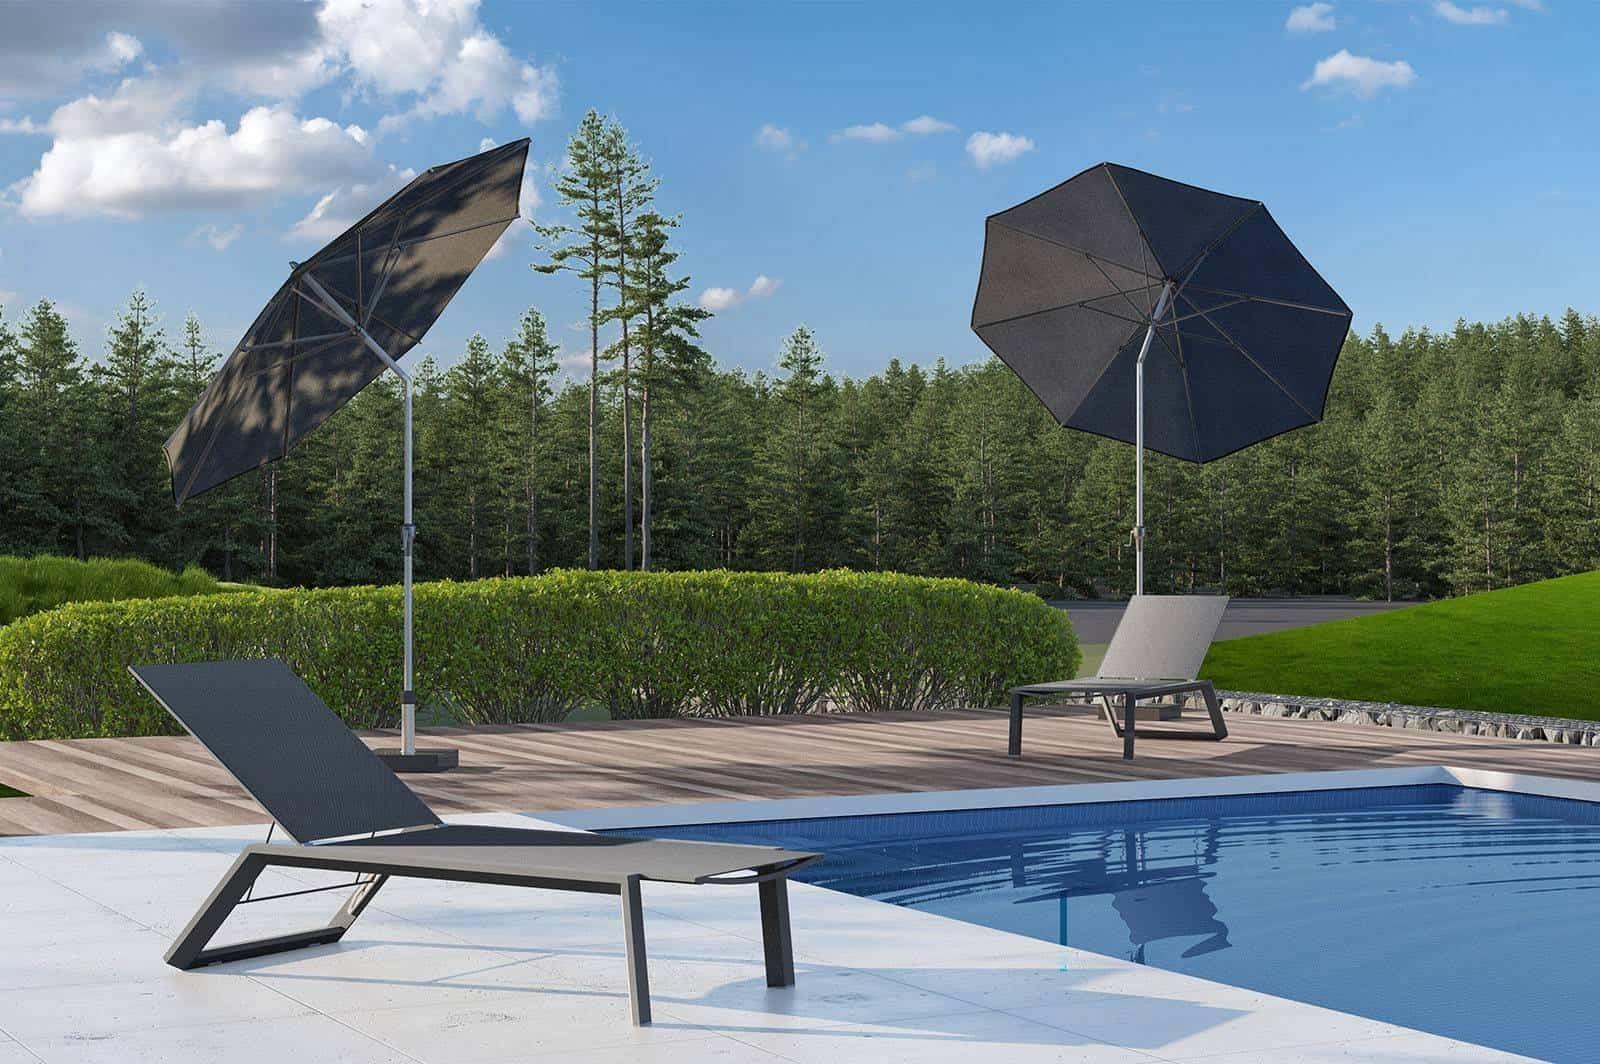 leżaki ogrodowe MURCIA z parasolami Platinum